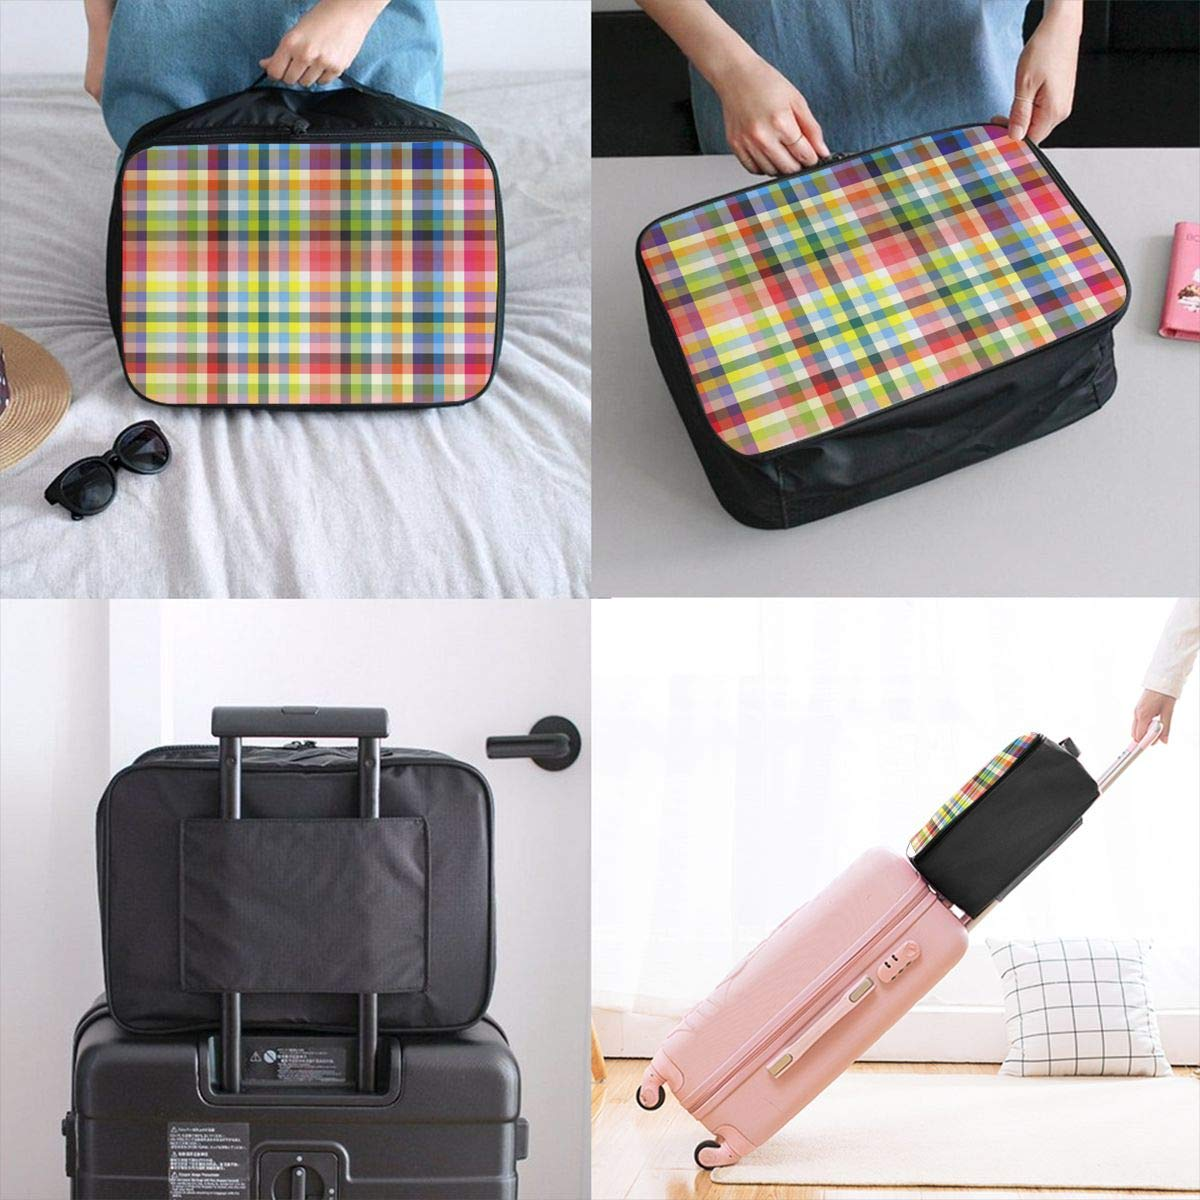 ADGAI Diagonal Tartan Vibrant Green Canvas Travel Weekender Bag,Fashion Custom Lightweight Large Capacity Portable Luggage Bag,Suitcase Trolley Bag